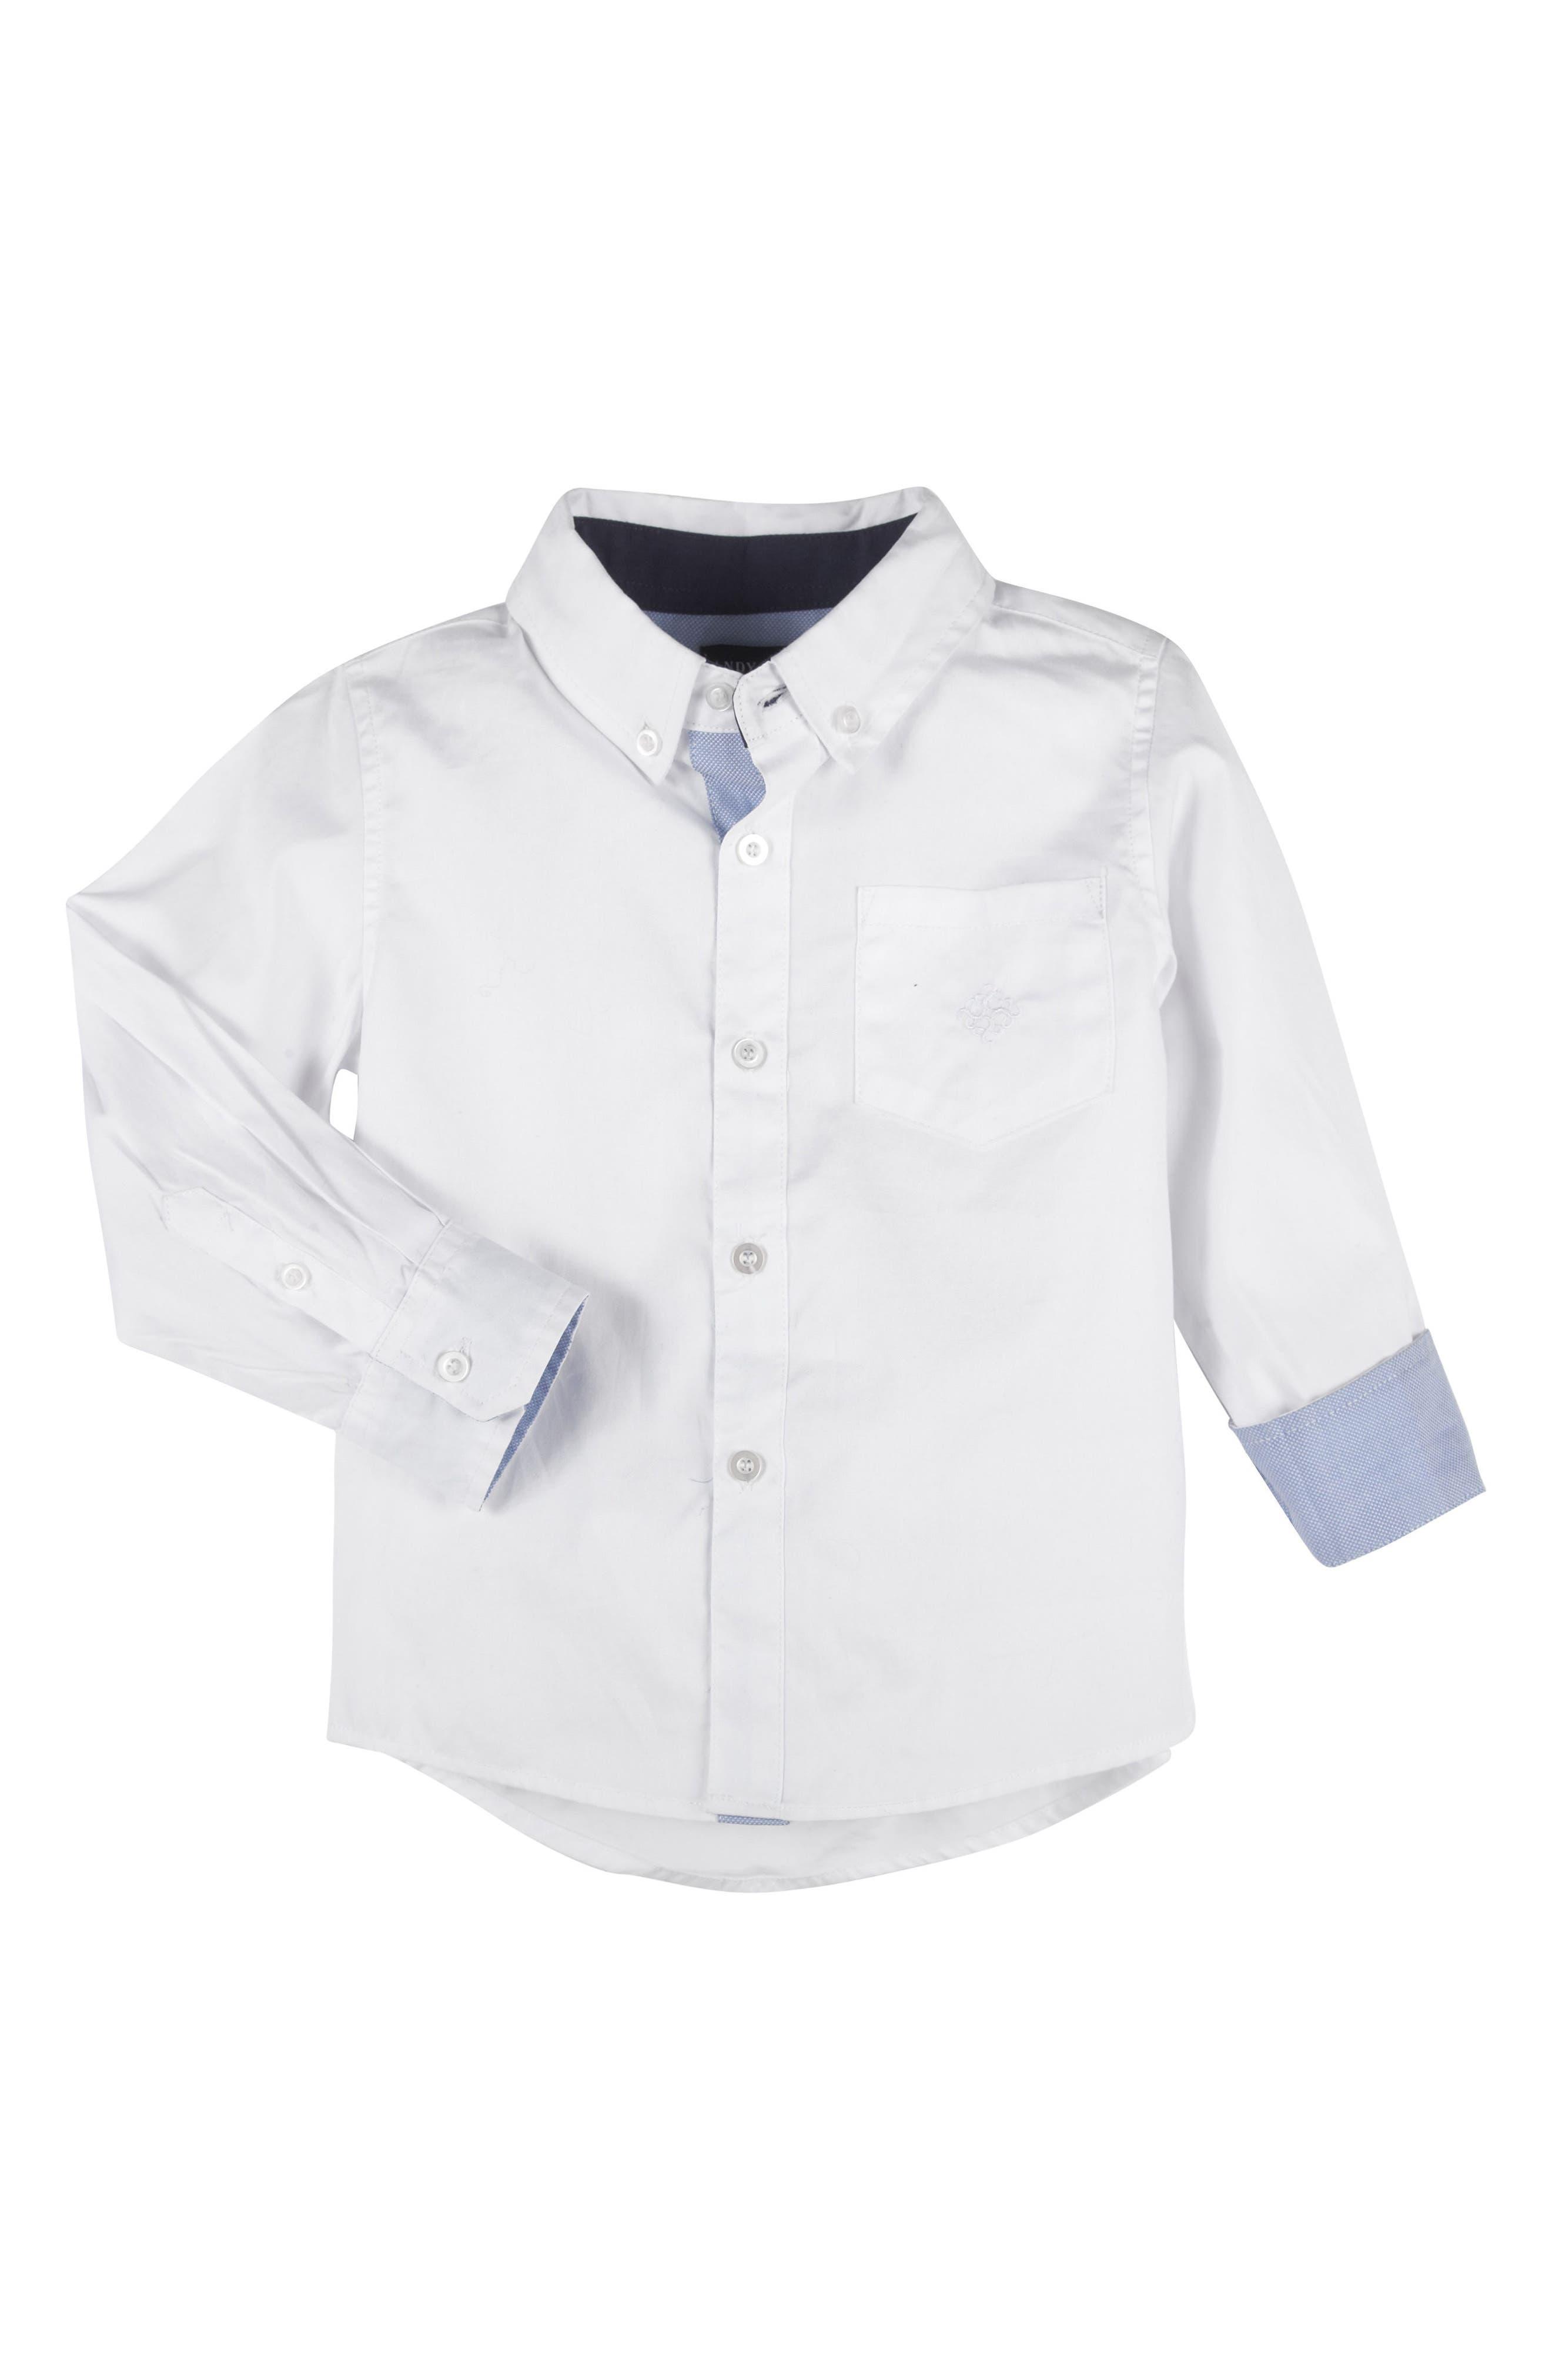 Main Image - Andy & Evan Oxford Shirt (Toddler Boys)